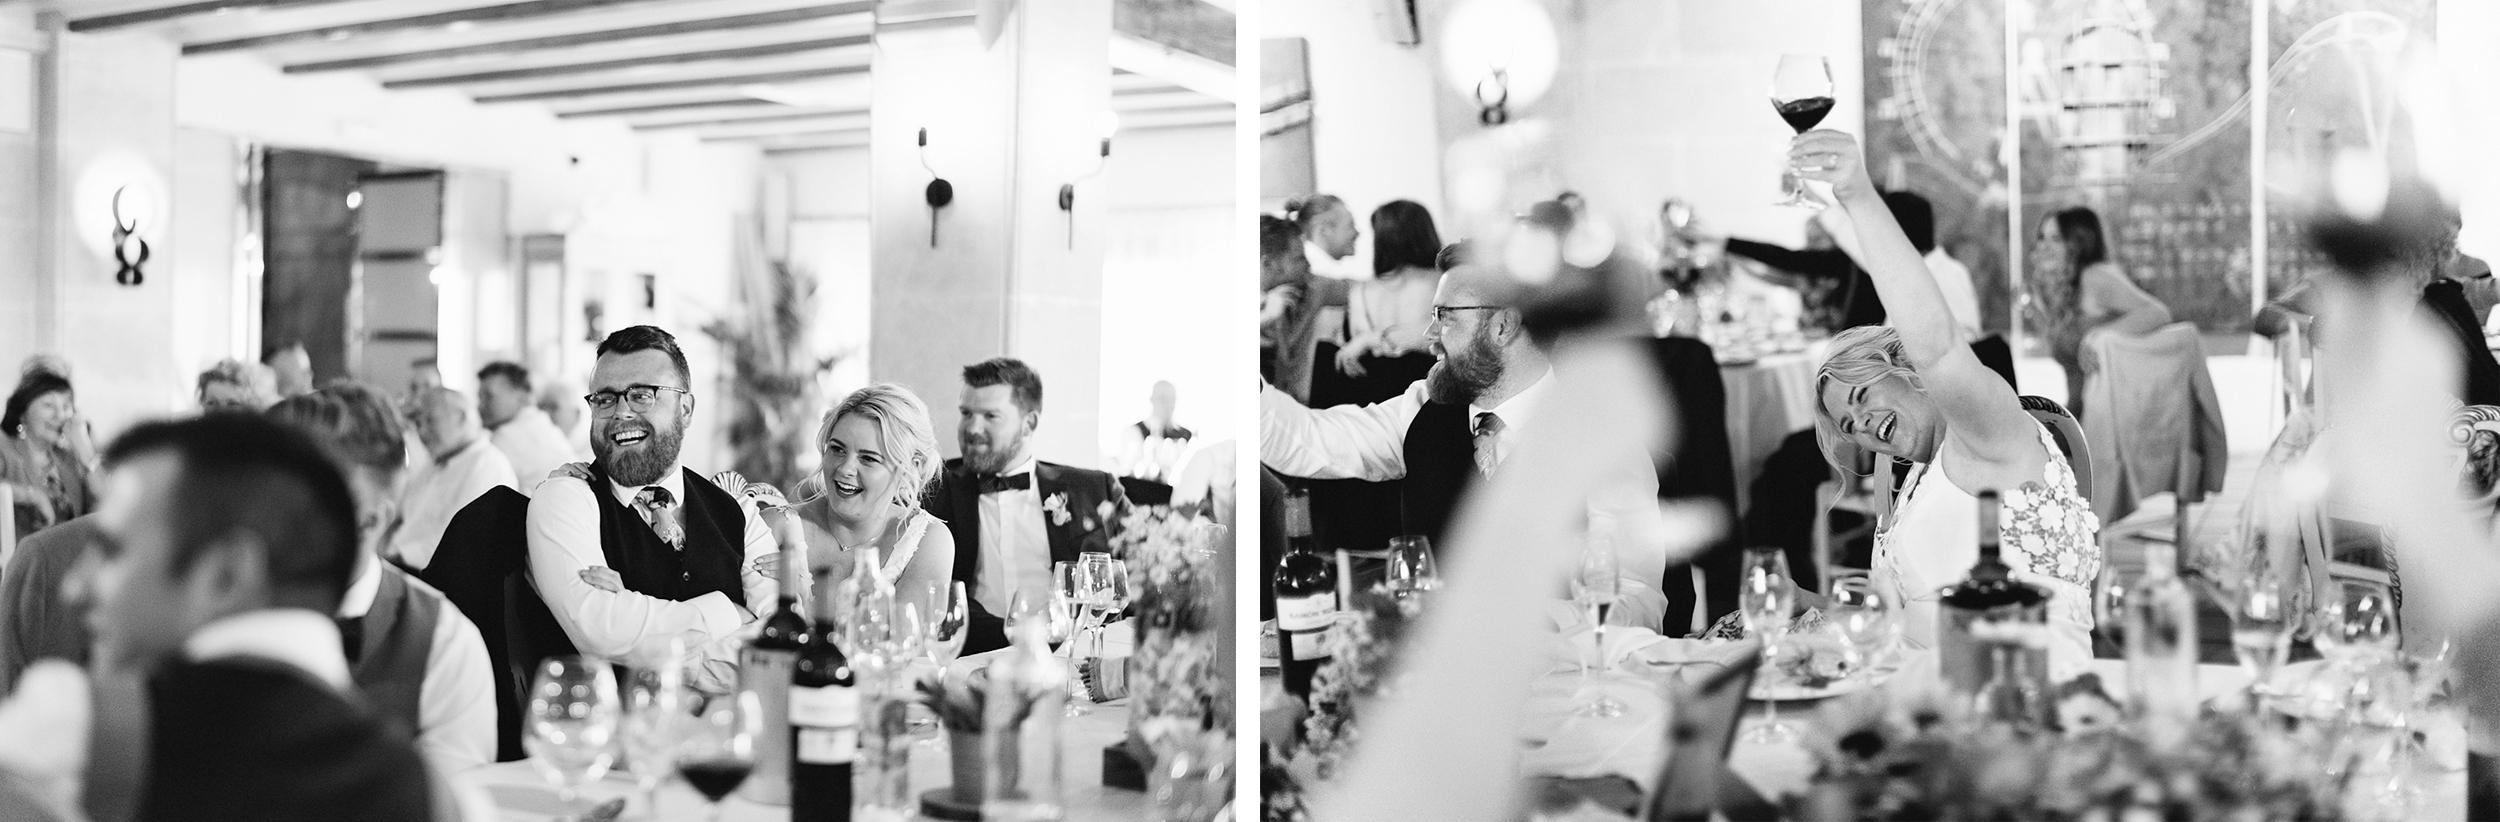 spread-26photographer-destination-wedding-photographer-from-toronto-ryanne-hollies-photography-documentary-editorial-style-toronto-wedding-photographer-junebug-weddings-reception-guest-candids-bridde-and-groom-laughing.jpg